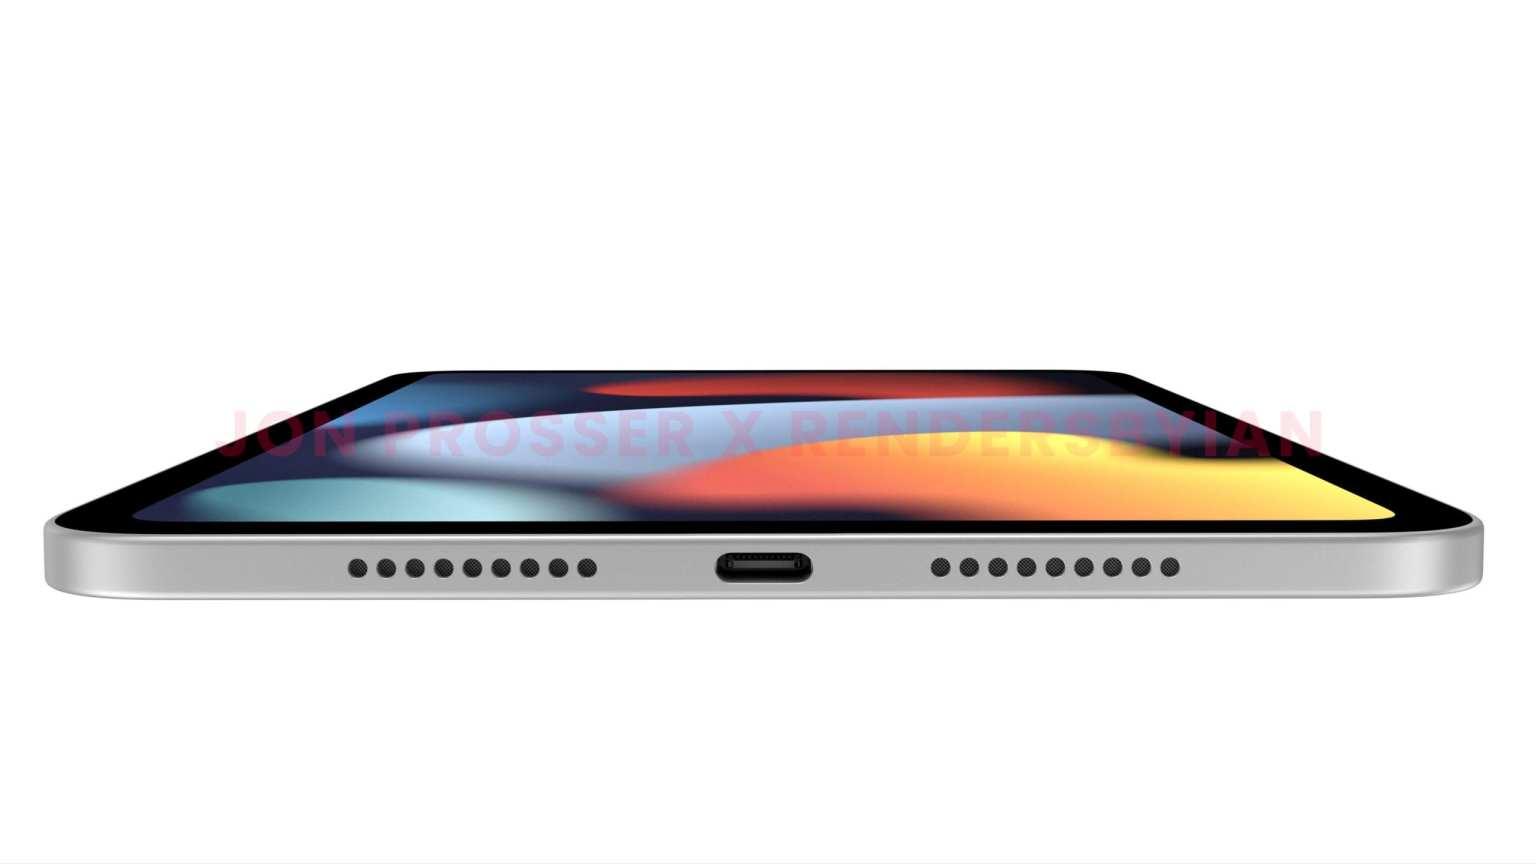 iPad mini USBC-C